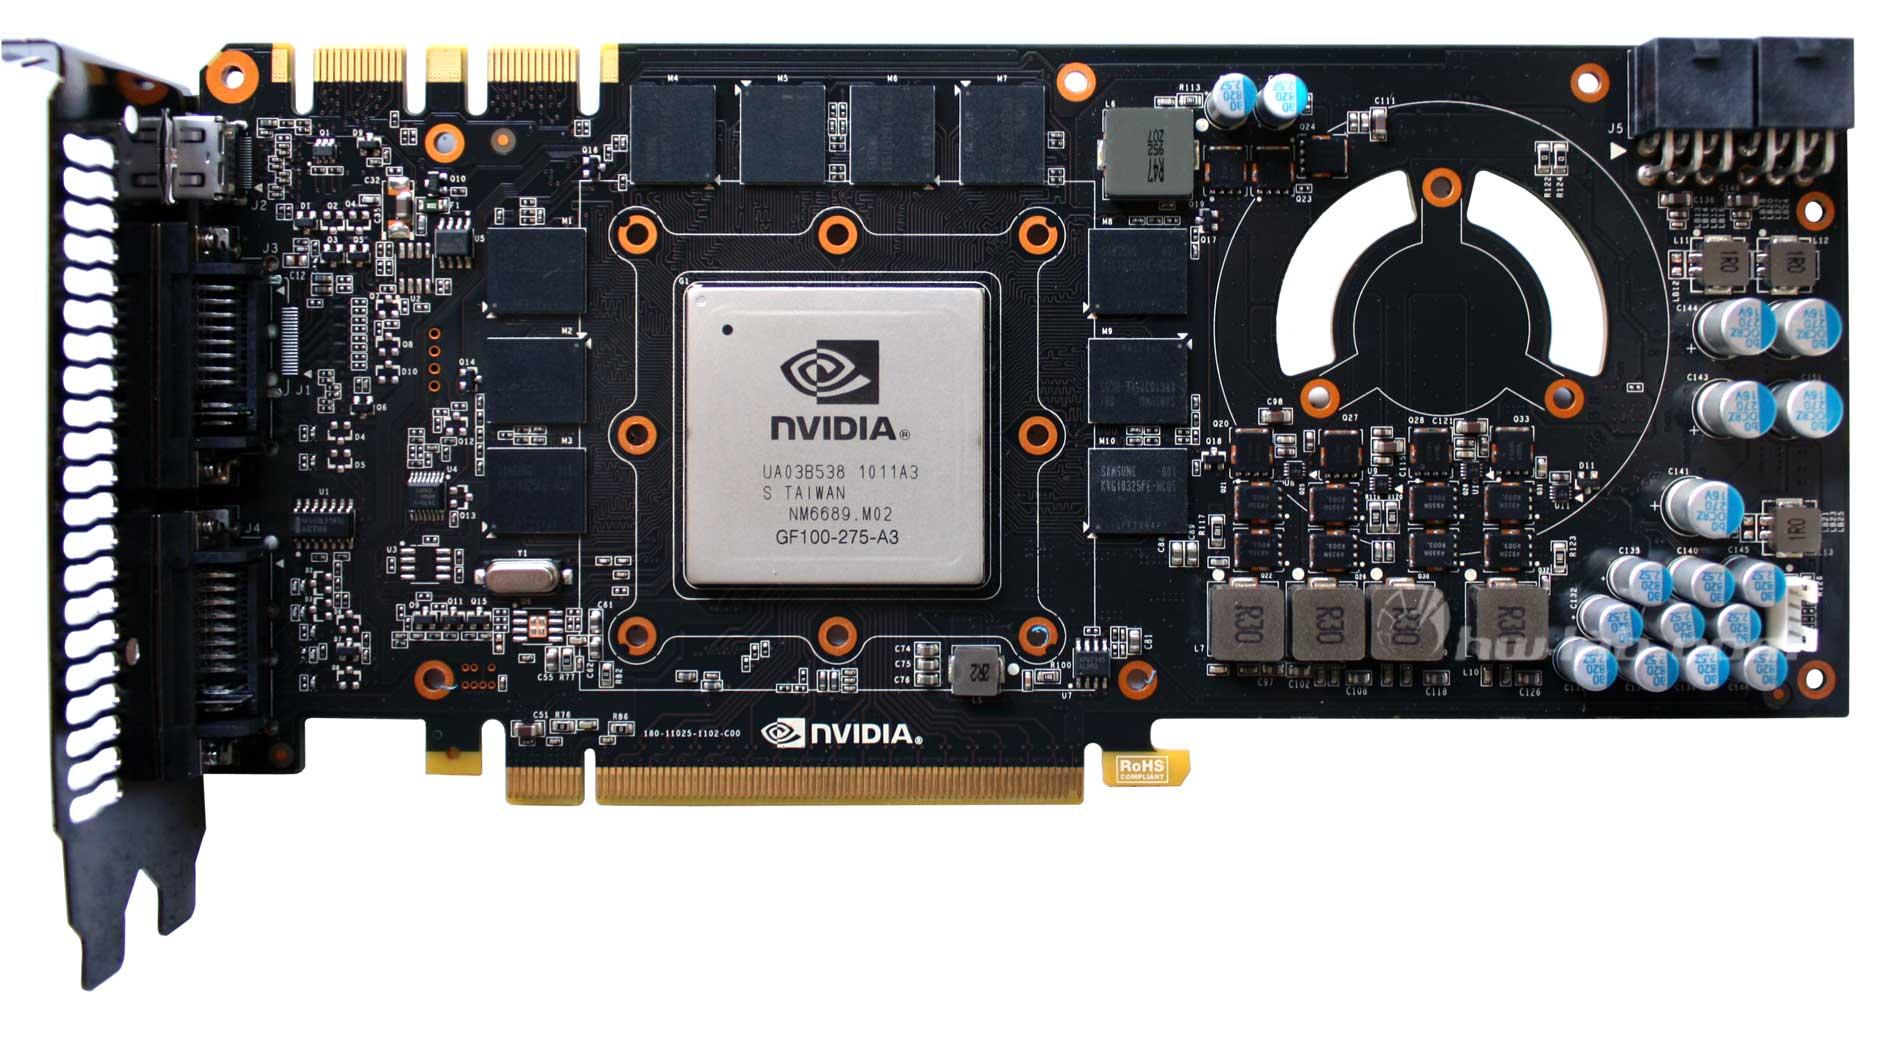 NVIDIA GeForce GTX 465 additionally Alfabetten   Alphabets   Alphabete together with 465オウム Â�ウムケージ・オウム用品 ɳ�用の besides GTX 470 besides Realistic TRC 465  same As Uniden PC 122. on 465 html